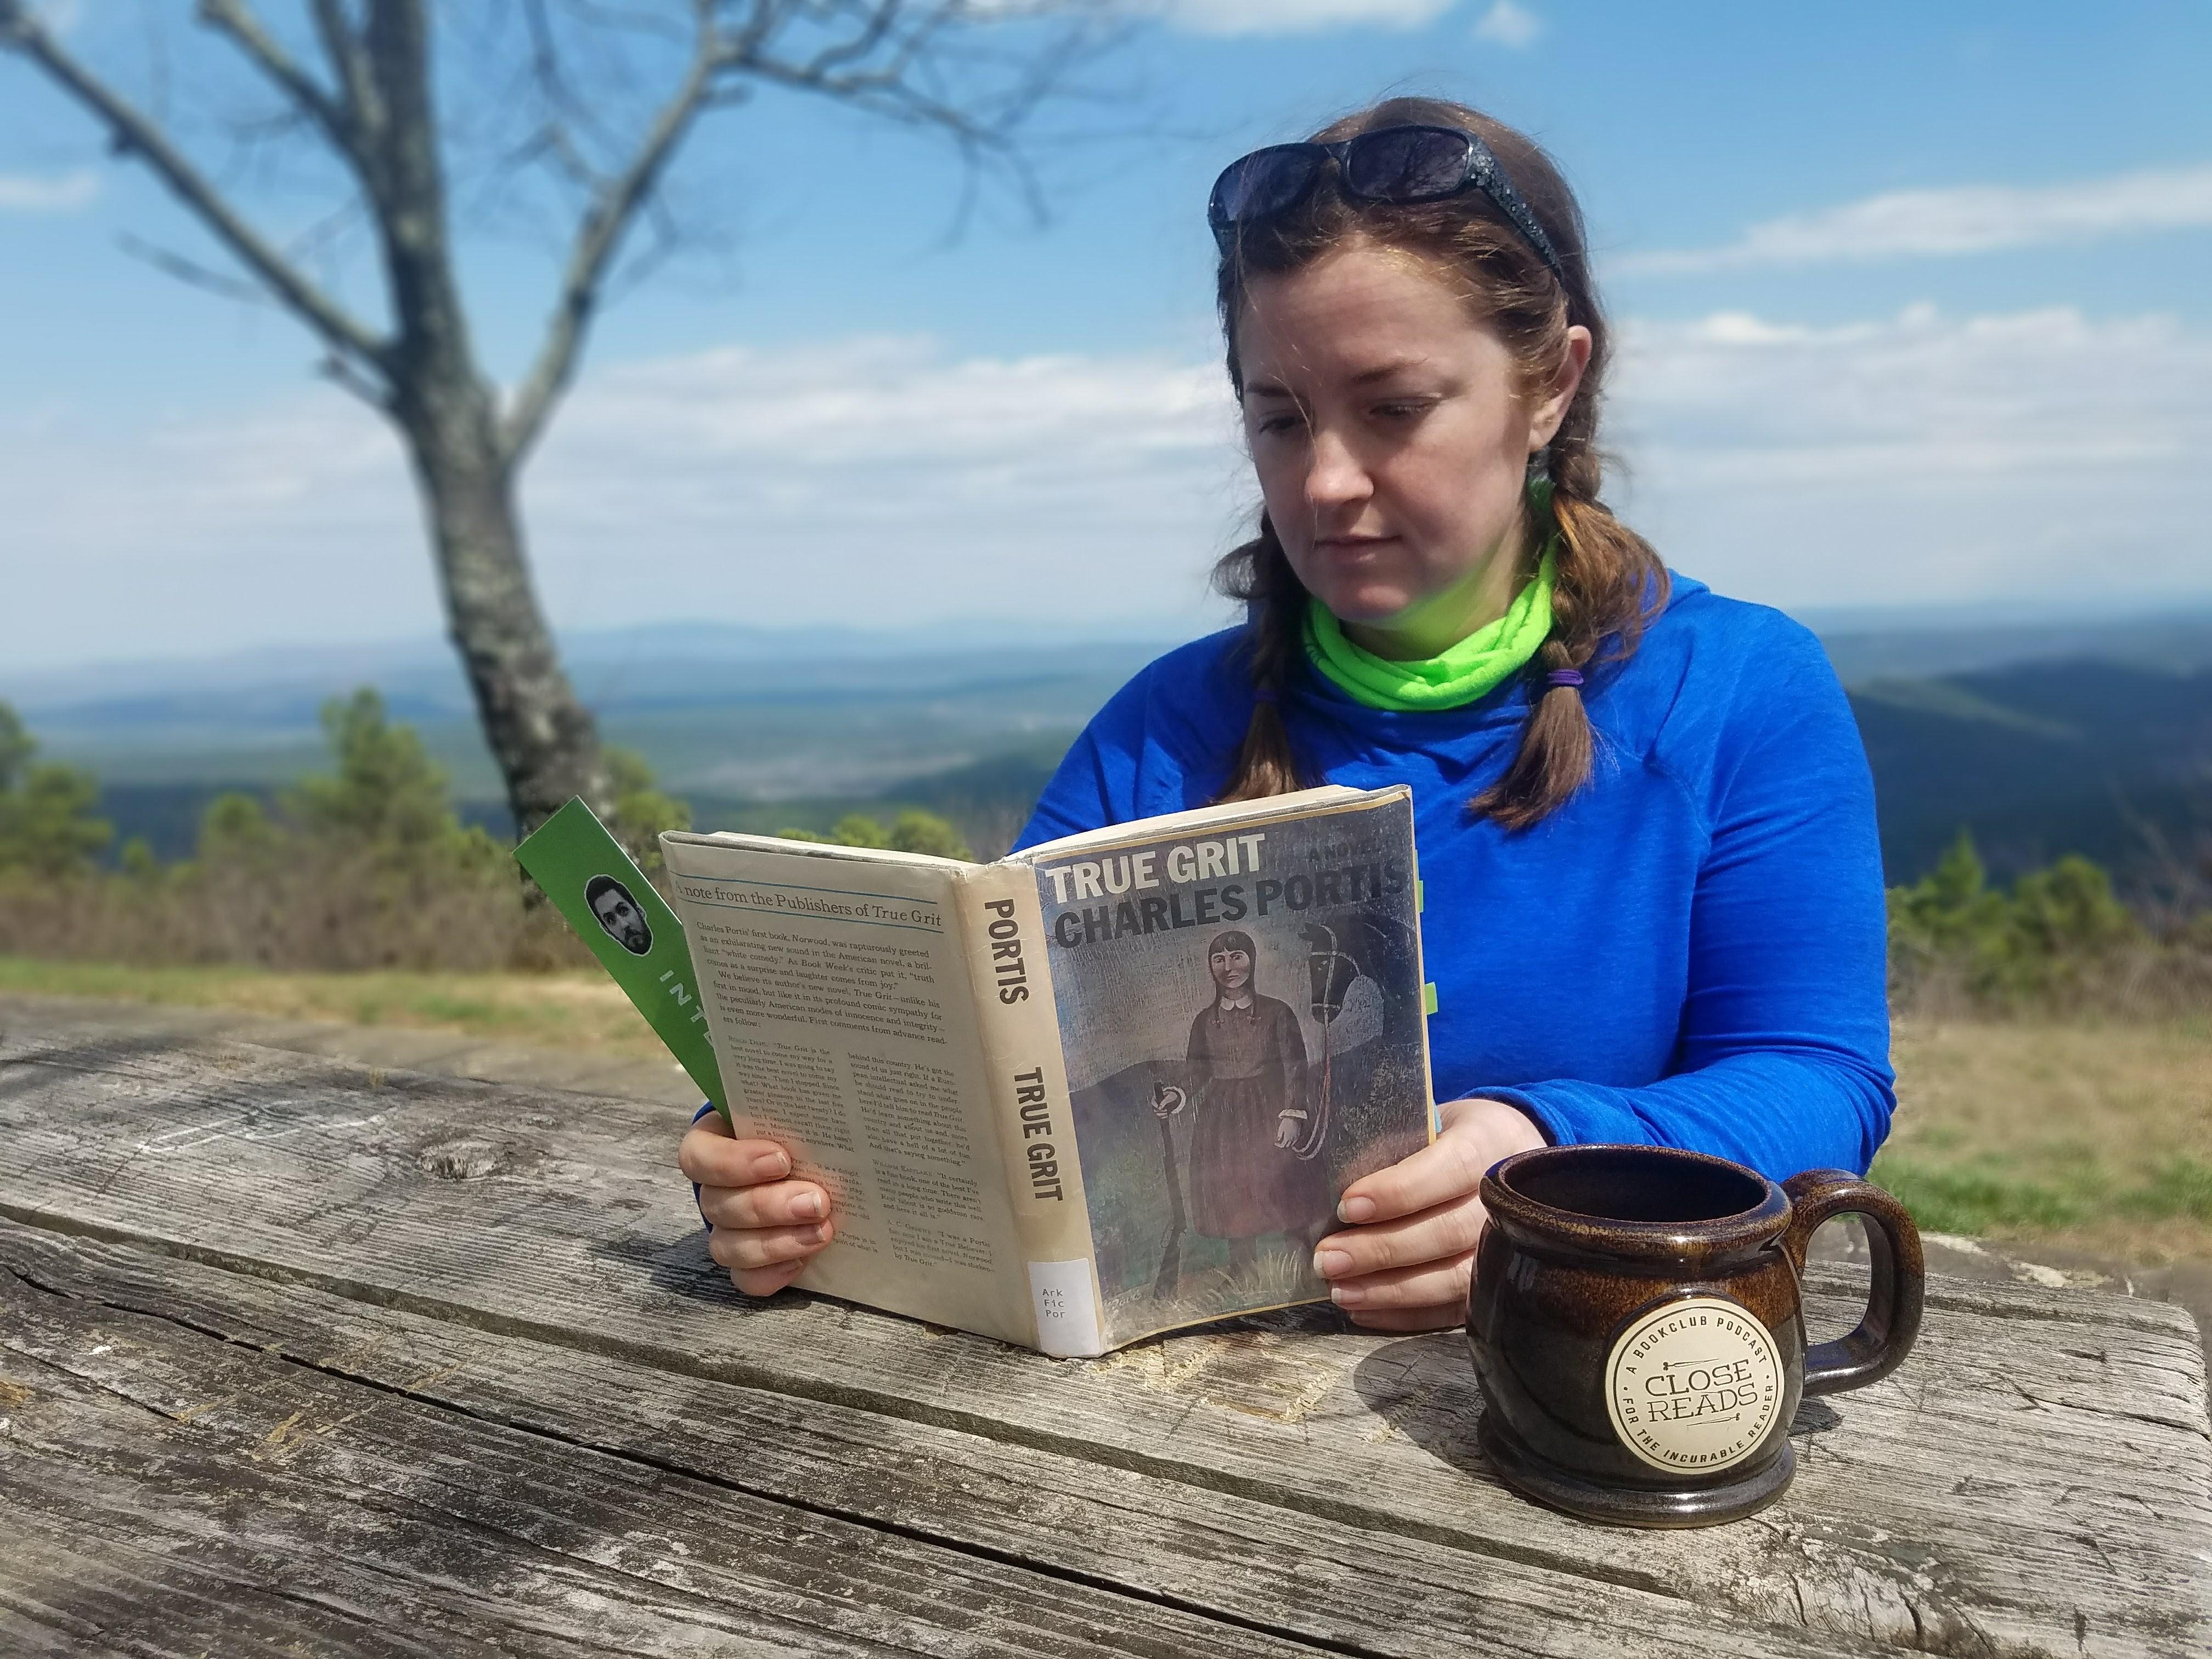 True Grit book outdoor hike